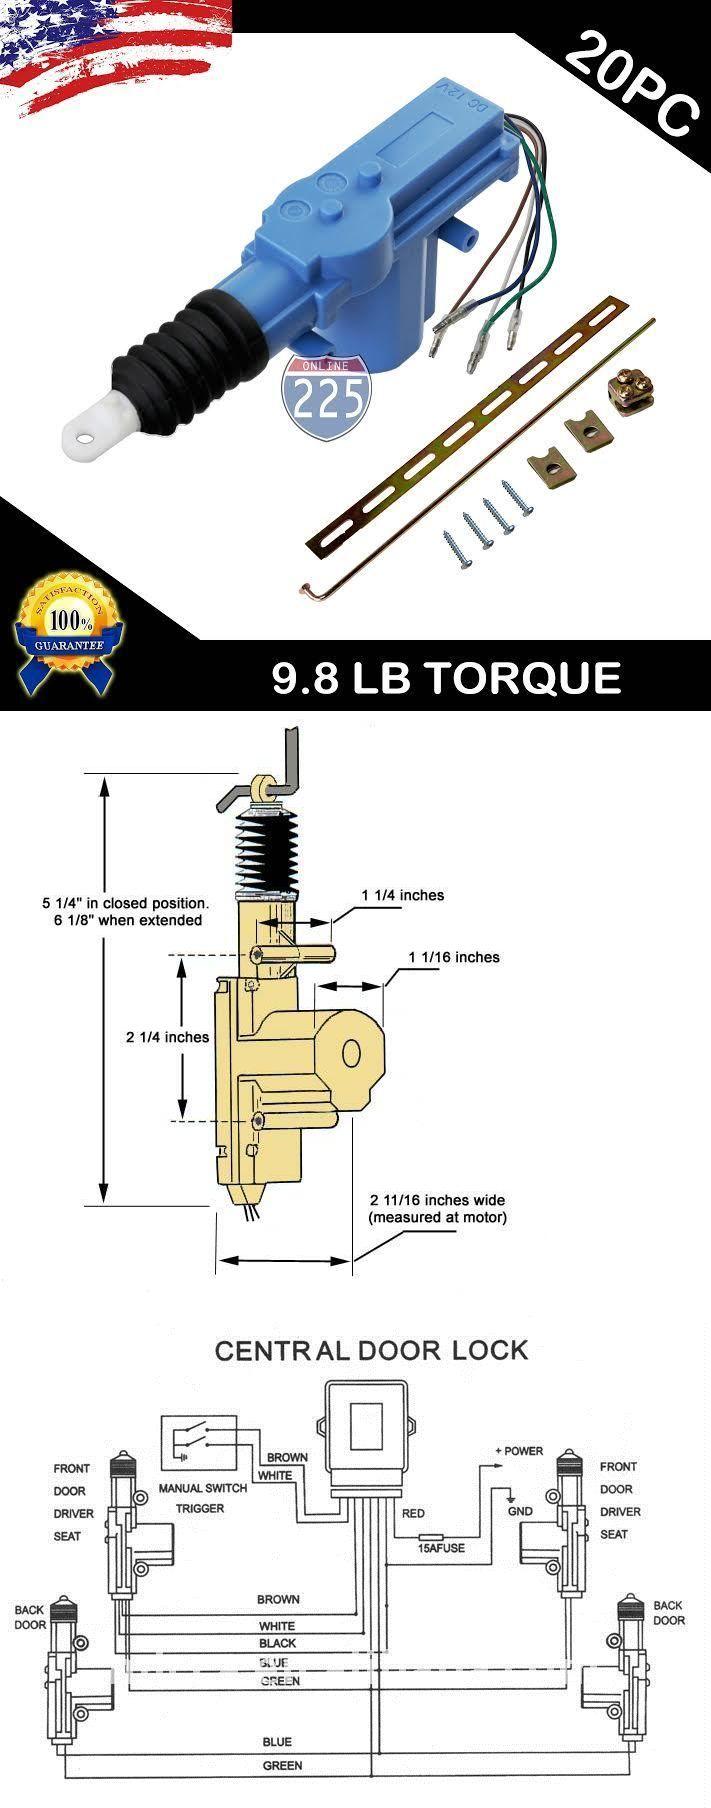 5 Wire Door Lock Actuator Wiring Diagram : actuator, wiring, diagram, Other, Alarms, Security:, Universal, Power, Actuator, Motor, 9.8Lb, Torque, ONLY:, .99, EBay!